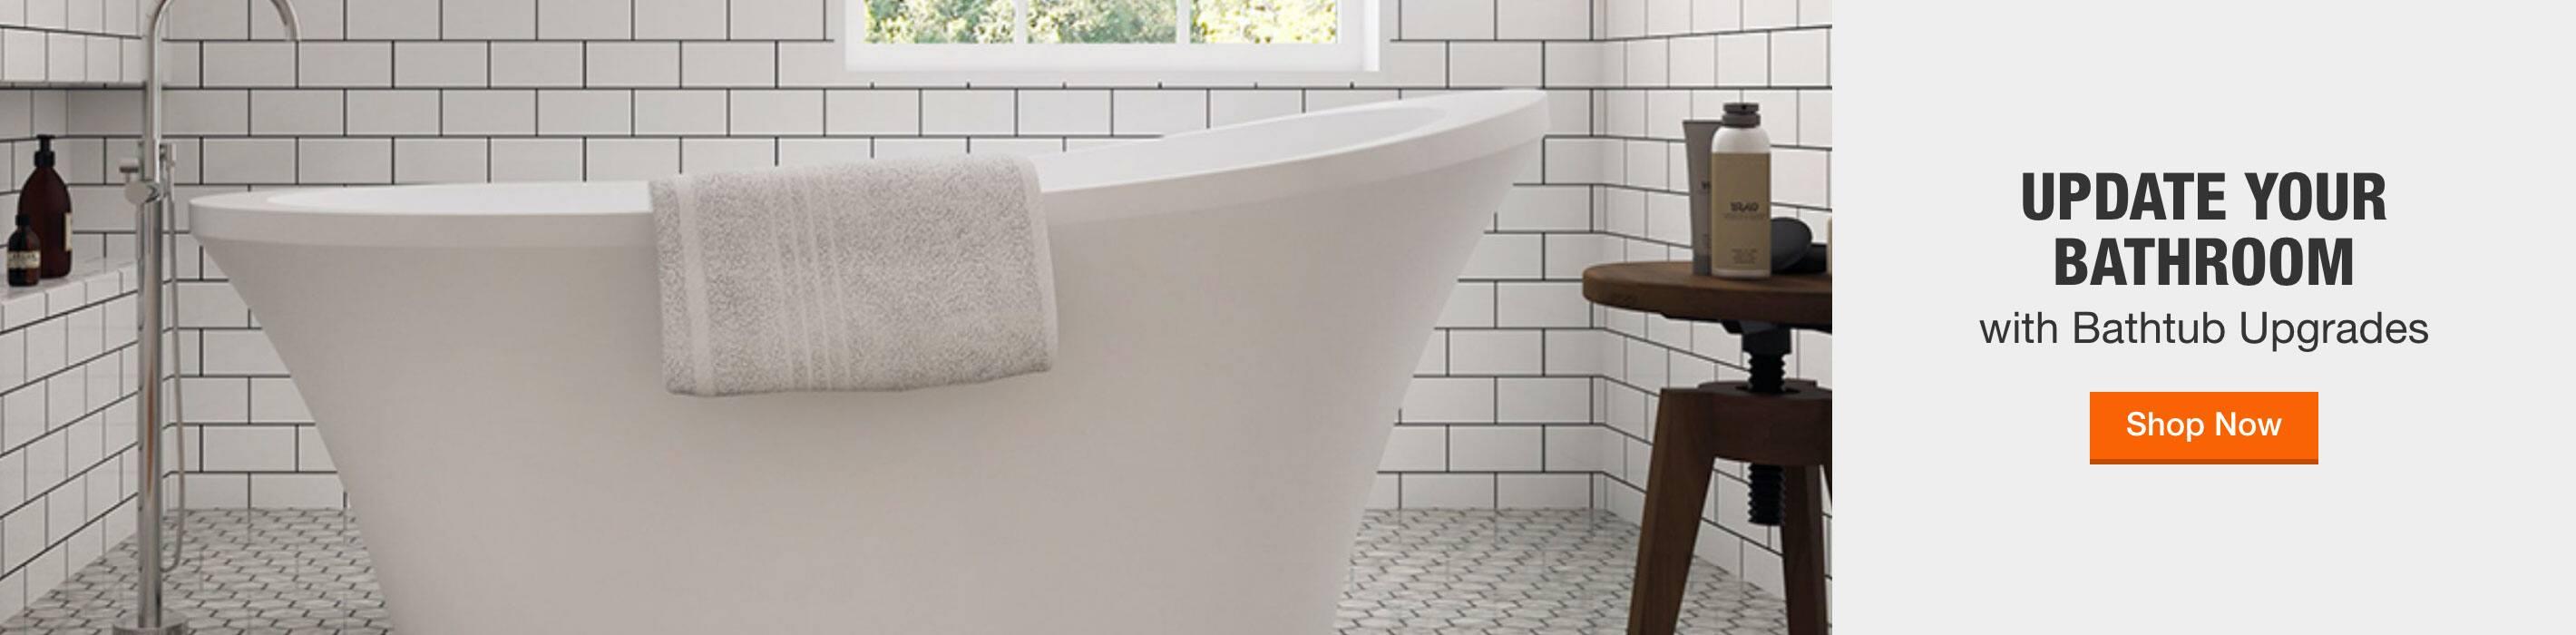 update your bathroom with bathtub upgrades. shop now.